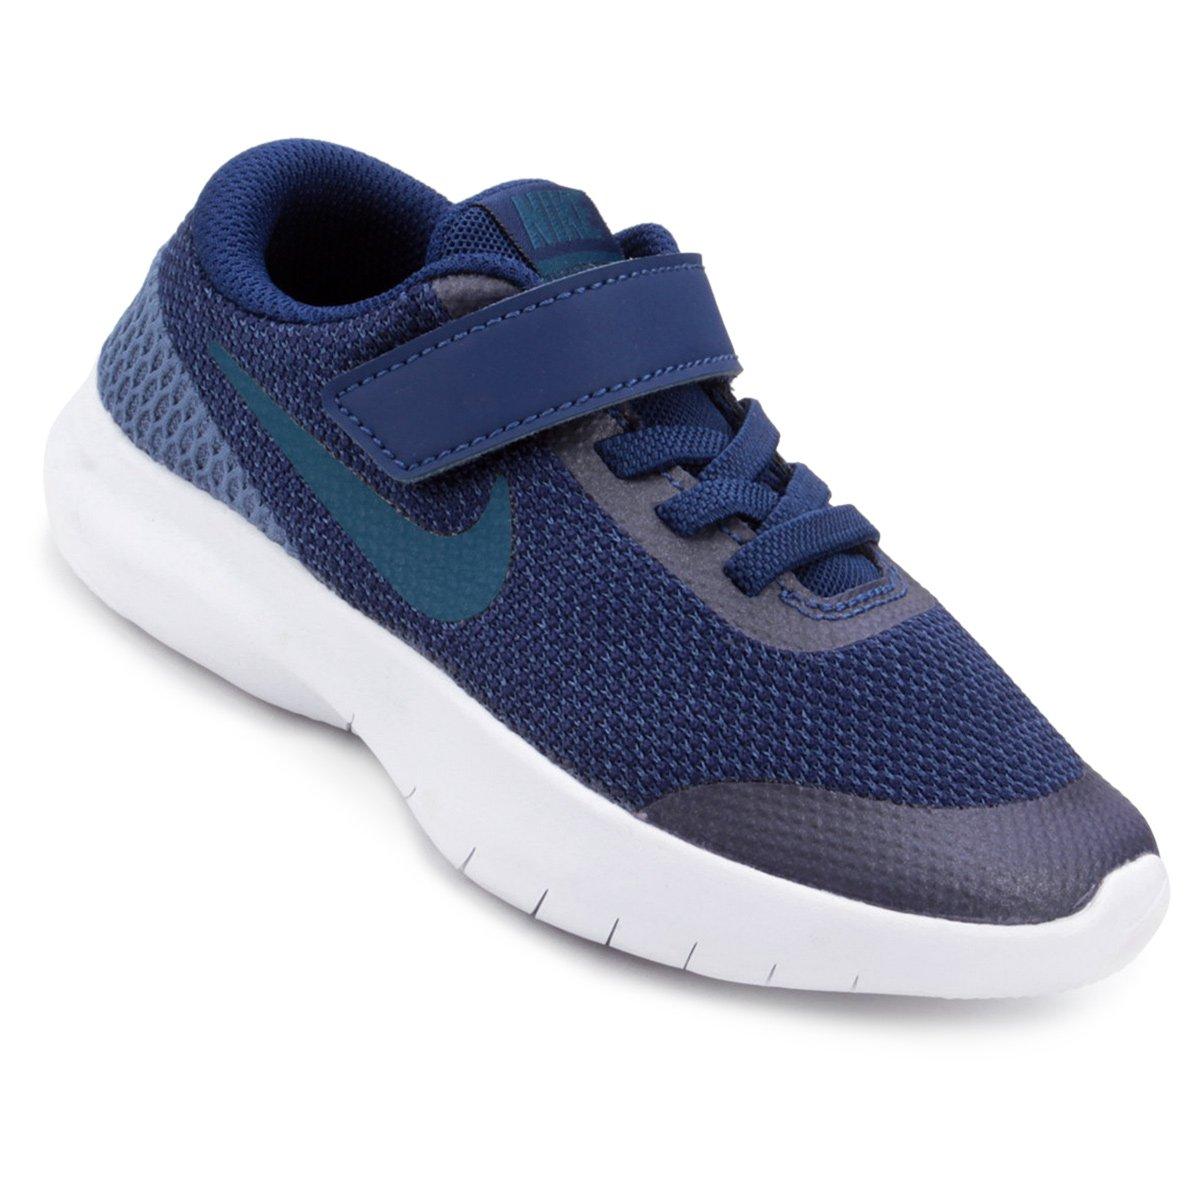 85cd8017d20 Tênis Infantil Nike Flex Experience Run 7 - Azul - Compre Agora ...